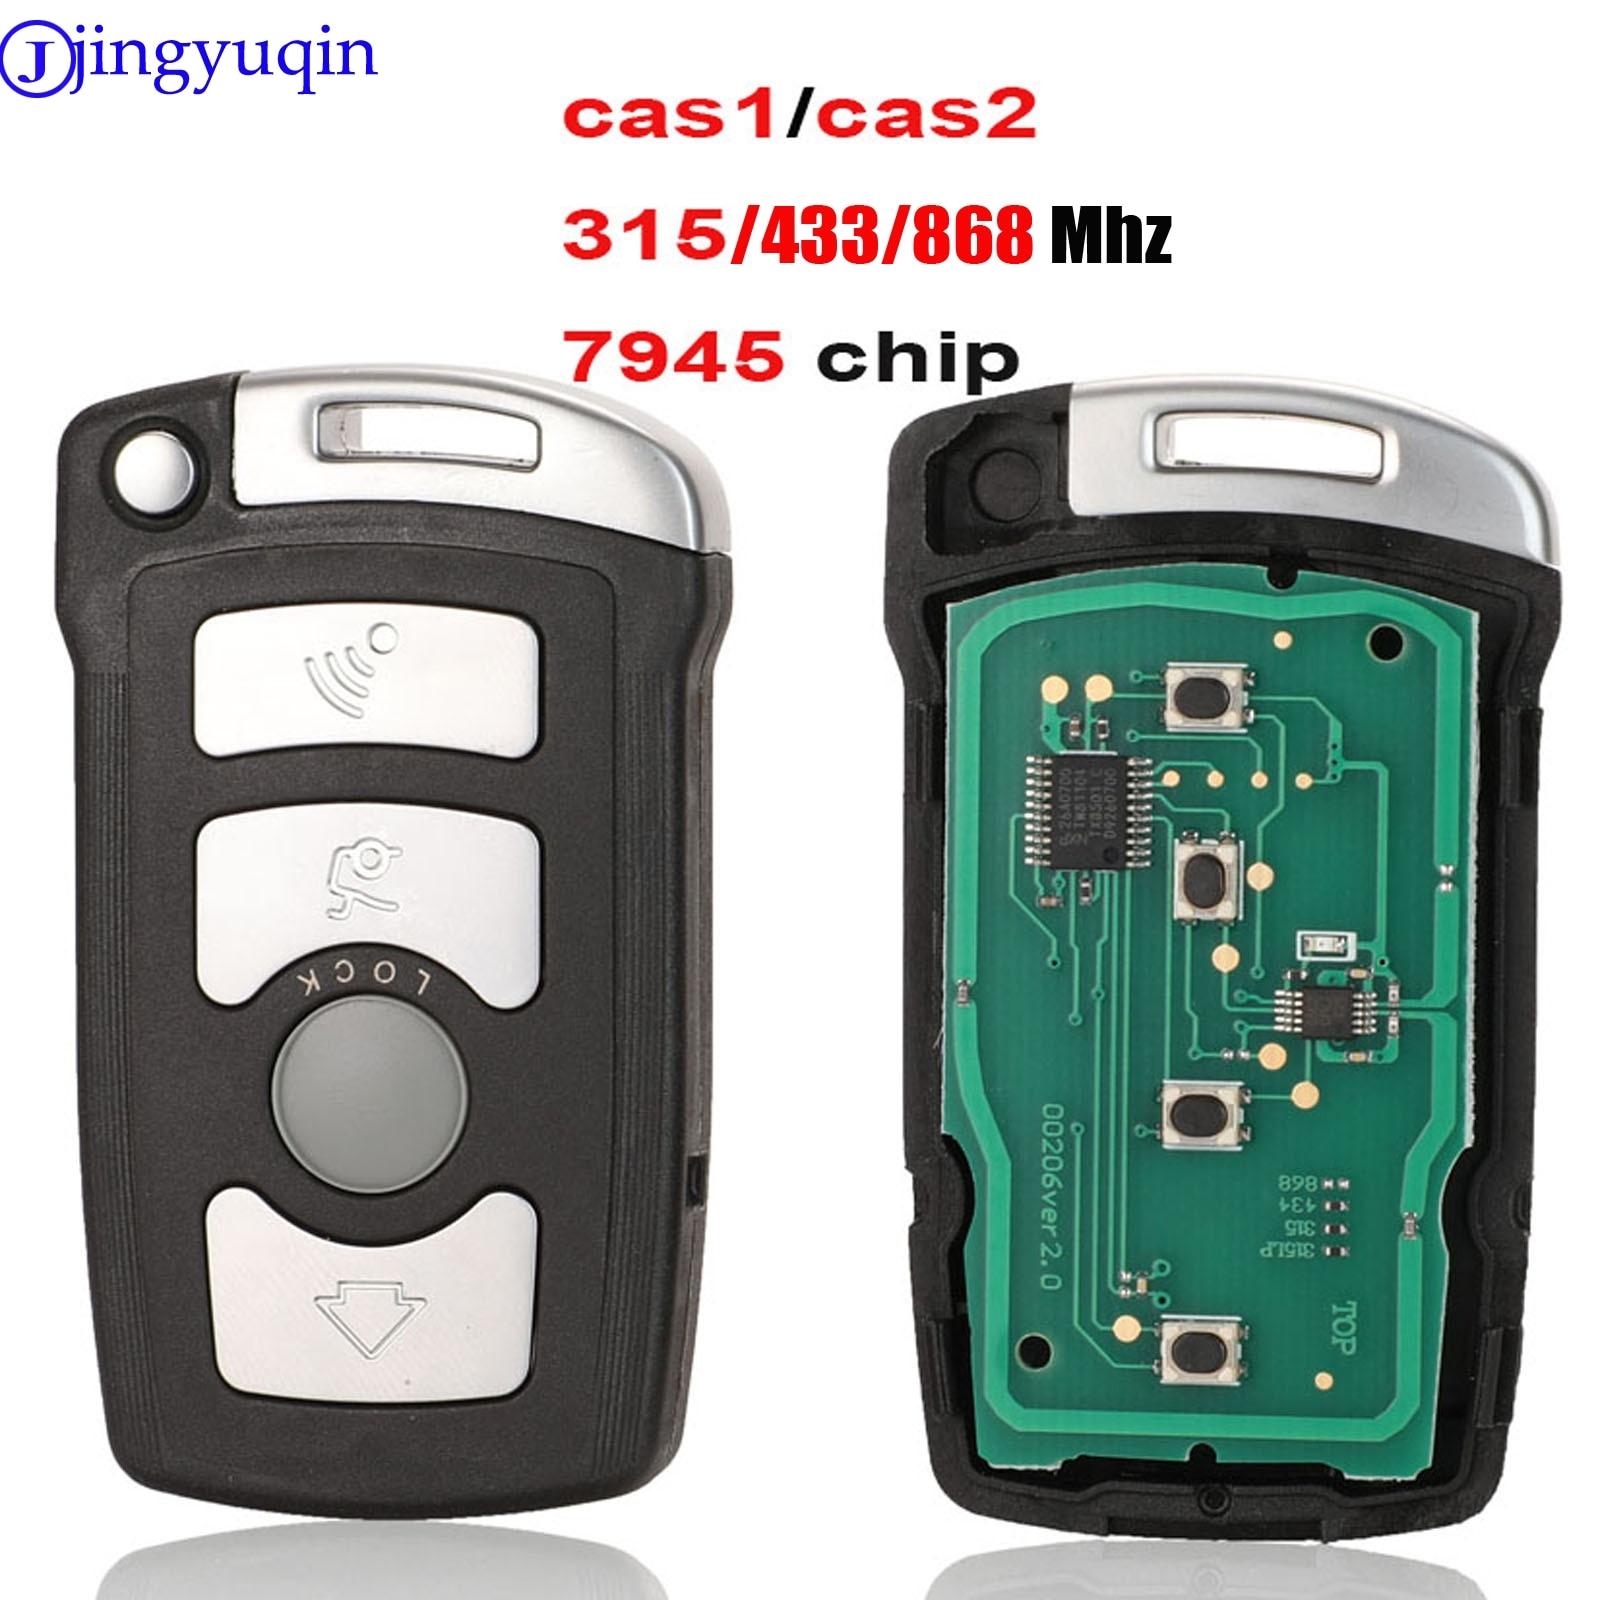 jingyuqin Full Remote Car Key 7945 chip For BMW 7 Series 730/740 (E65 / E66) CAS1 / CAS2 Anti-theft System 315/433/868